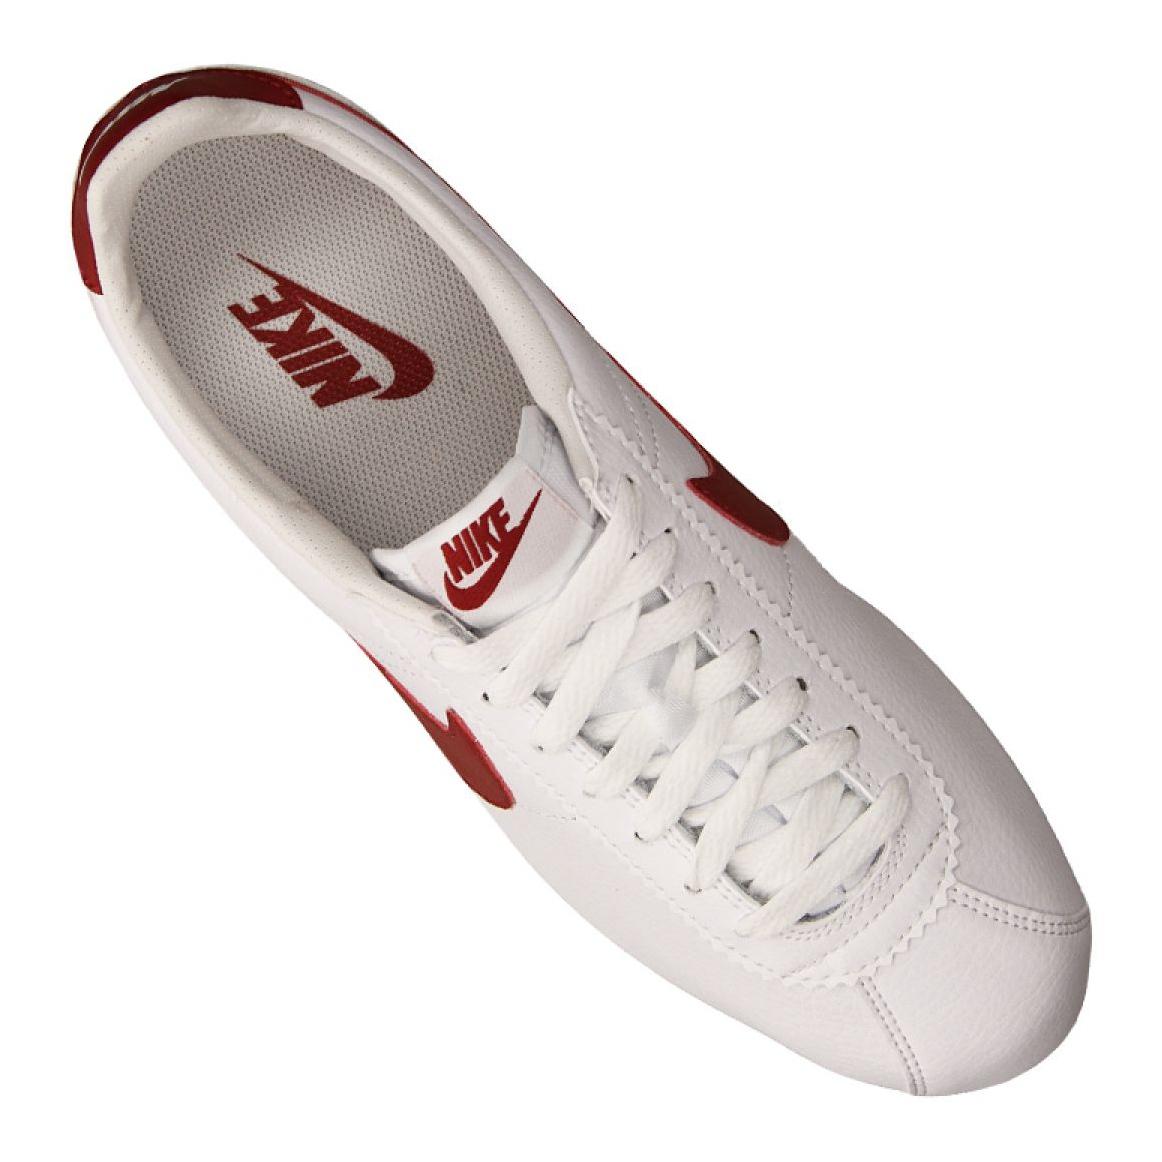 Zapatillas Nike Hombre | CLASSIC CORTEZ LEATHER 154 Blanco ~ Steelpav